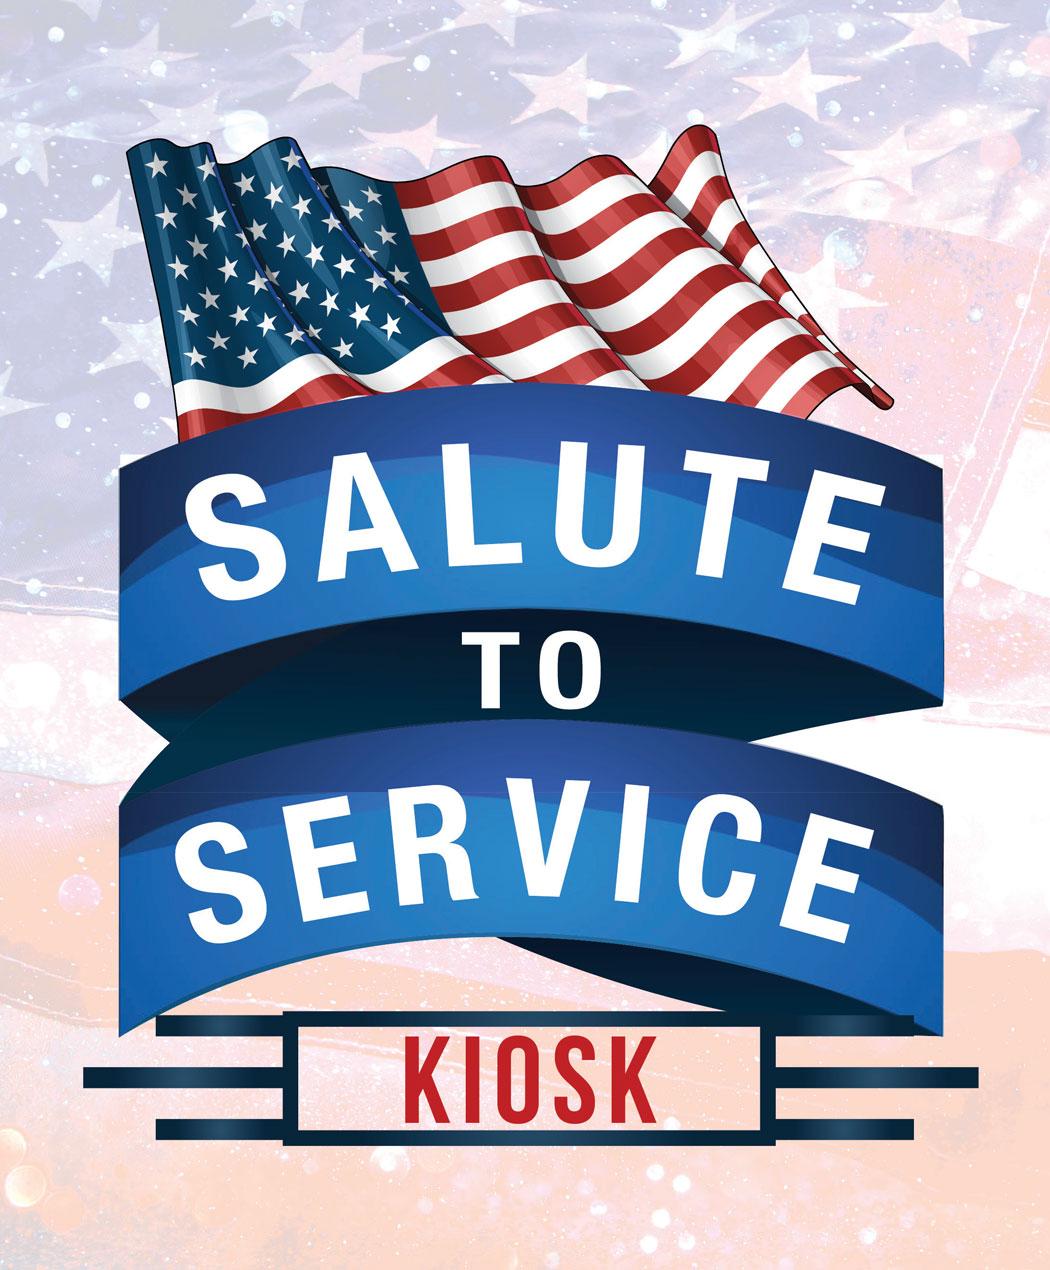 Salute To Service Kiosk